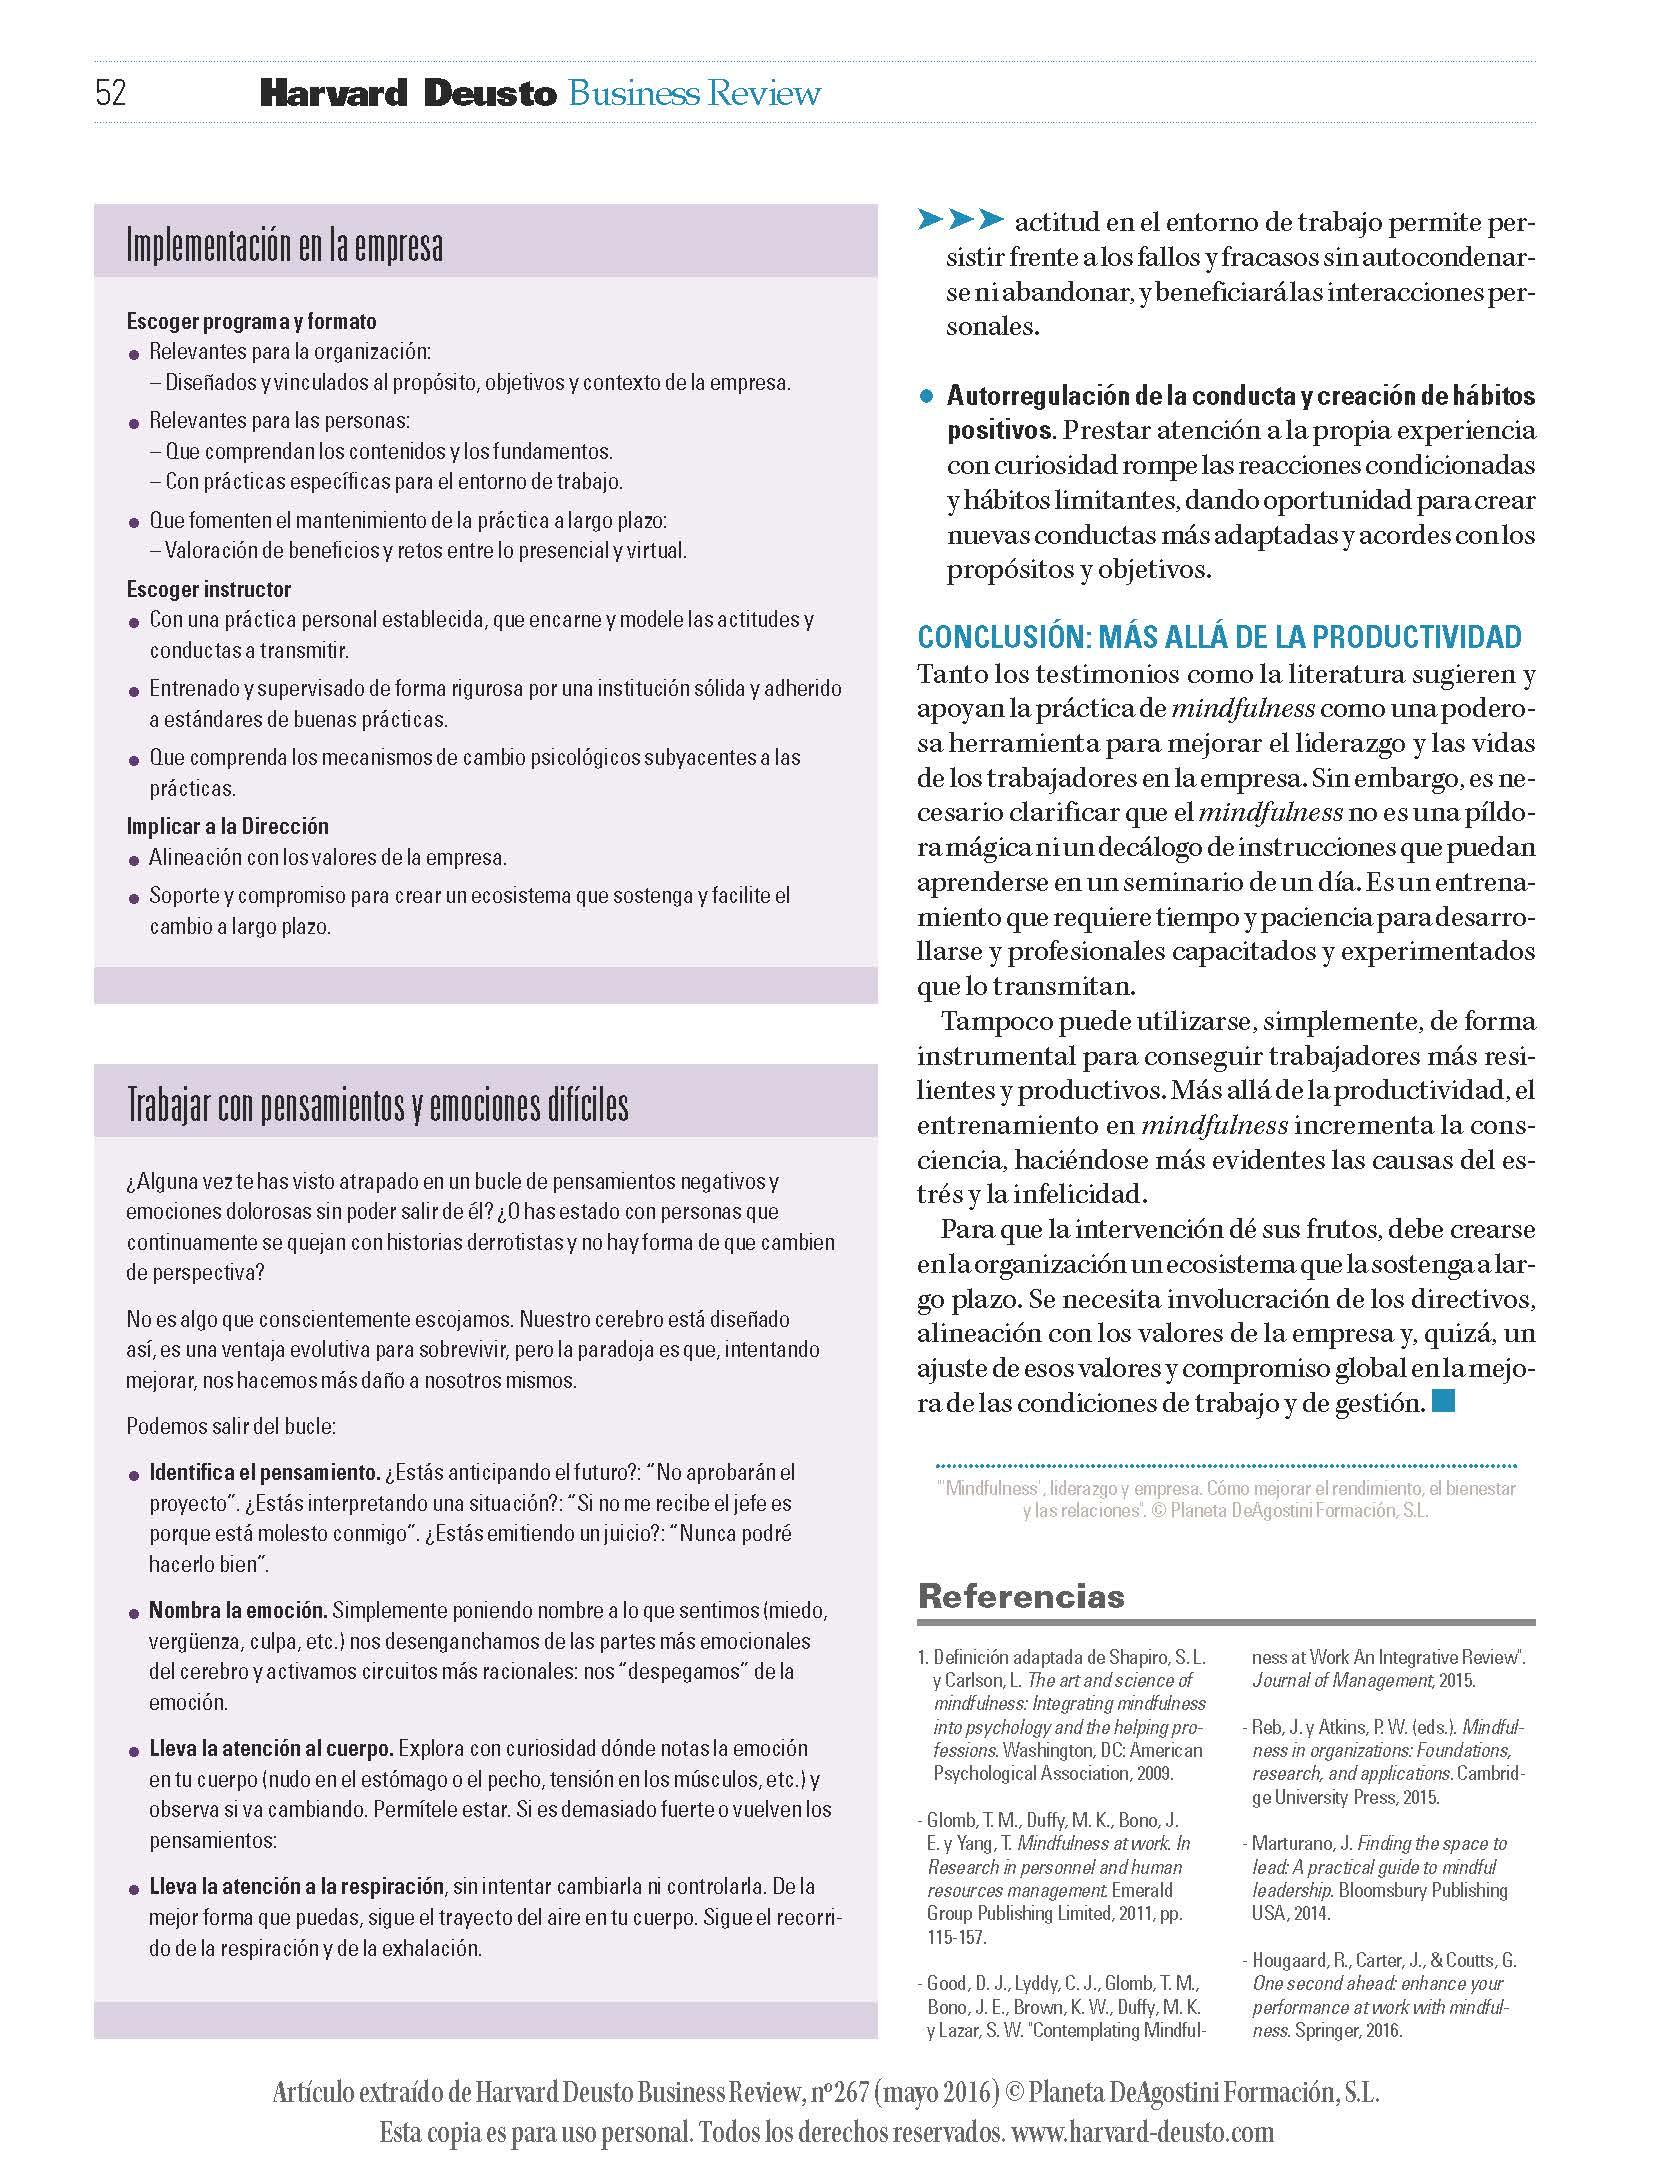 mindfulness y empresas. HBR. Estrella (2017)_Página_9.jpg